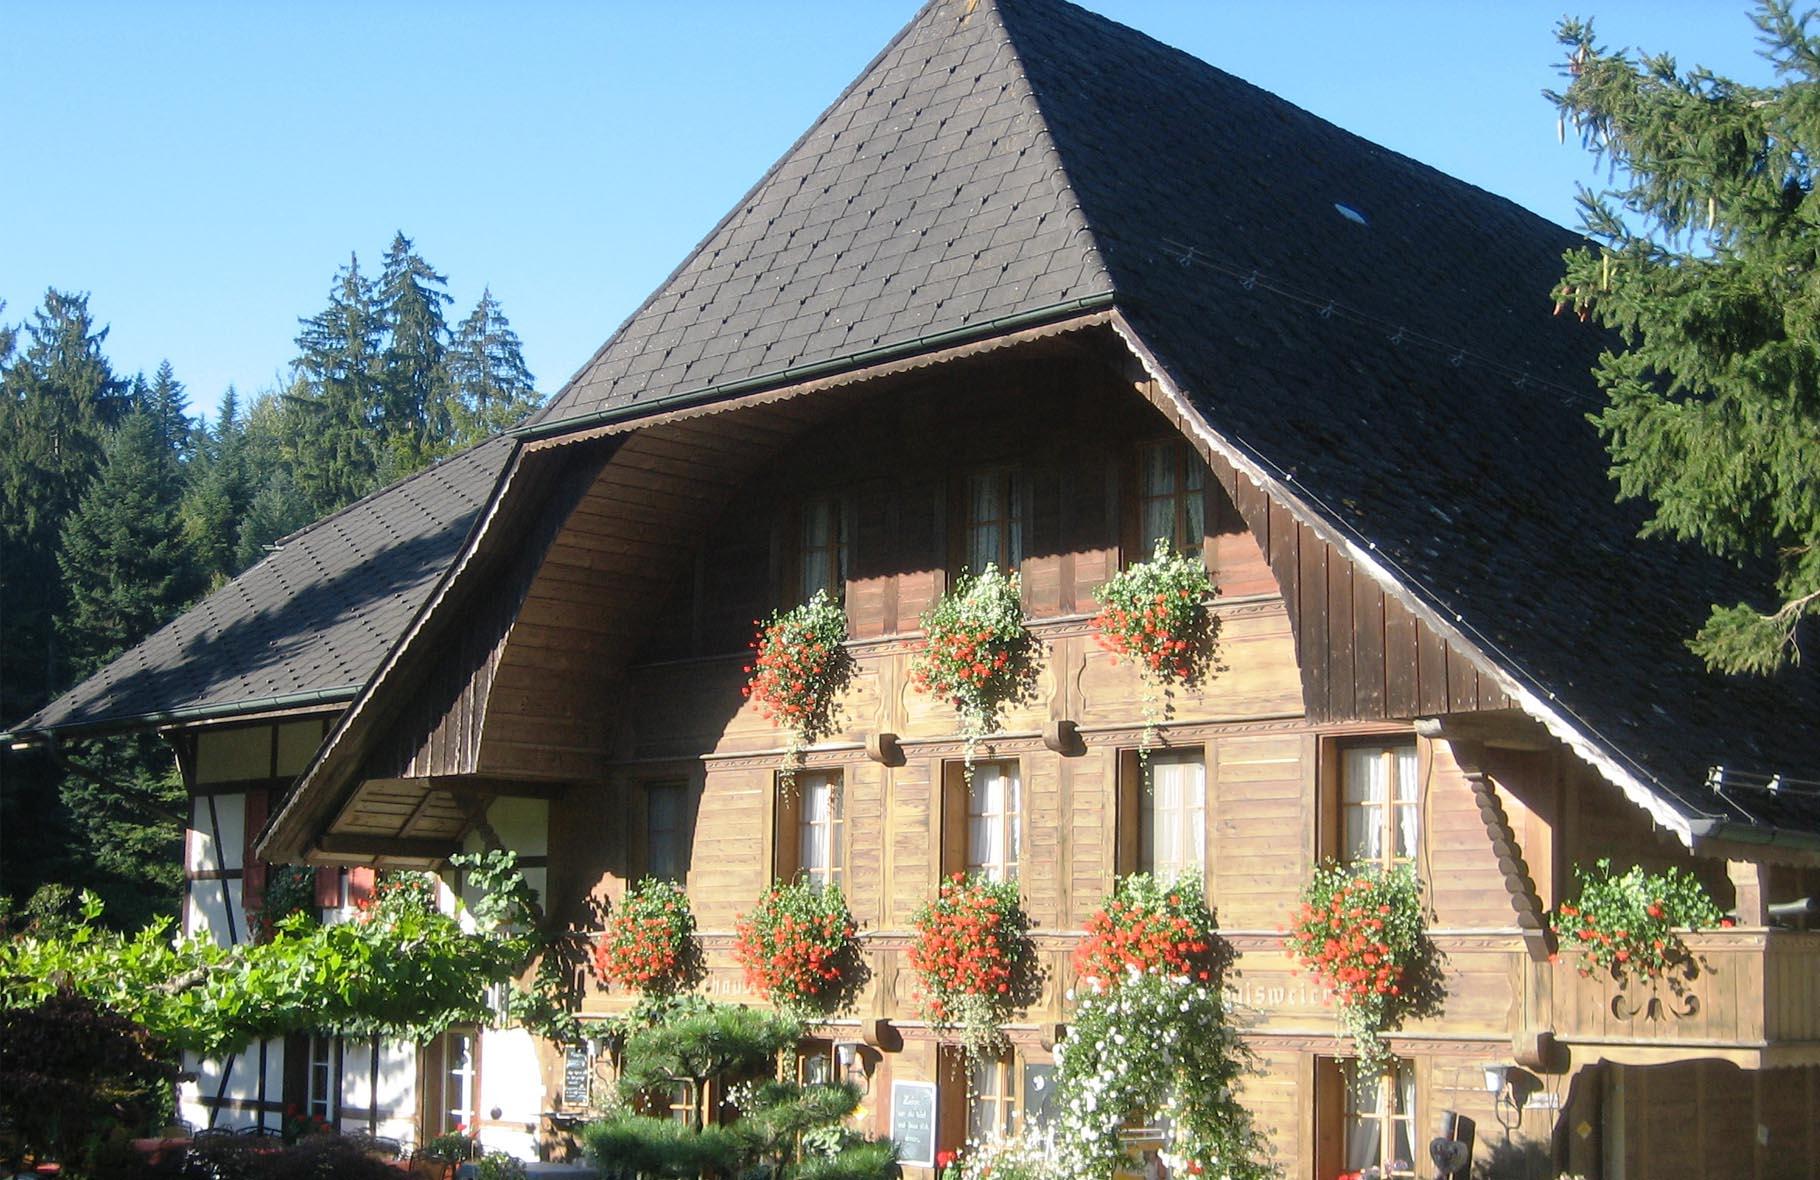 Restaurant Buergisweyerbad Madiswil